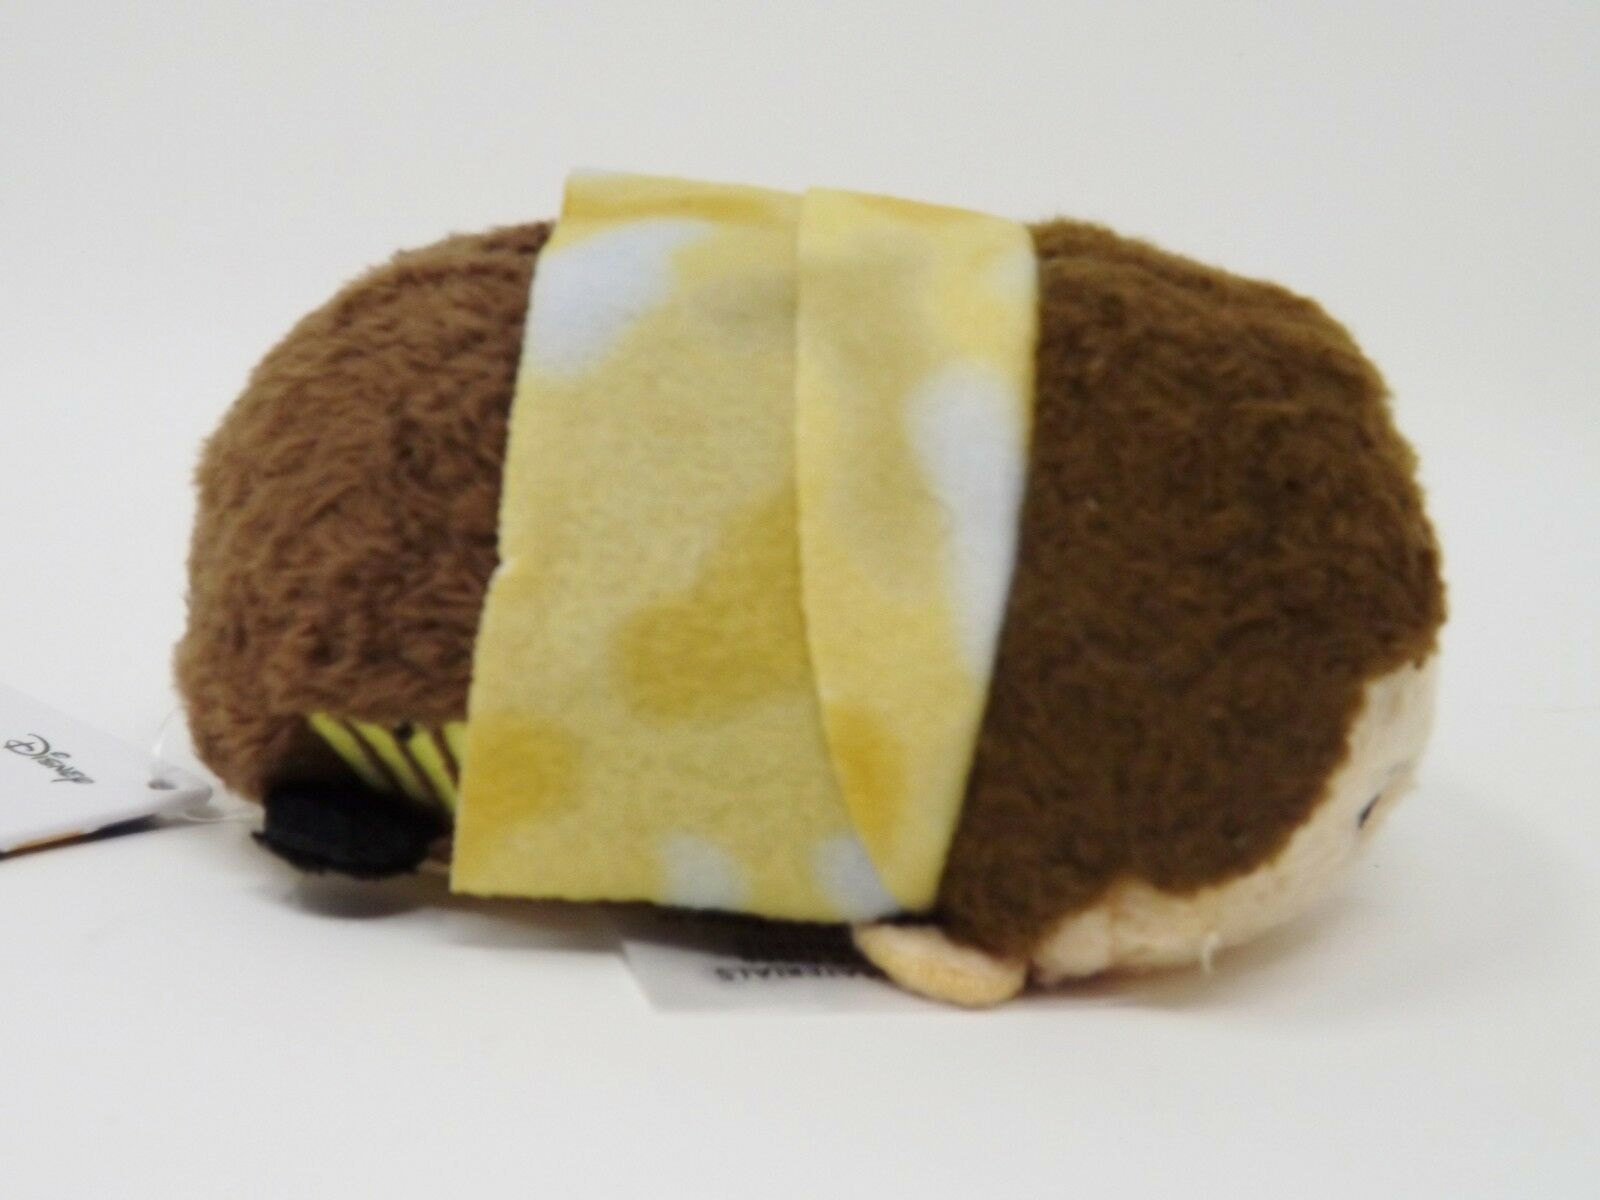 Disney Tsum Tsum Mini Soft Plush Stuffed Star Wars Endor - New - Hans Solo